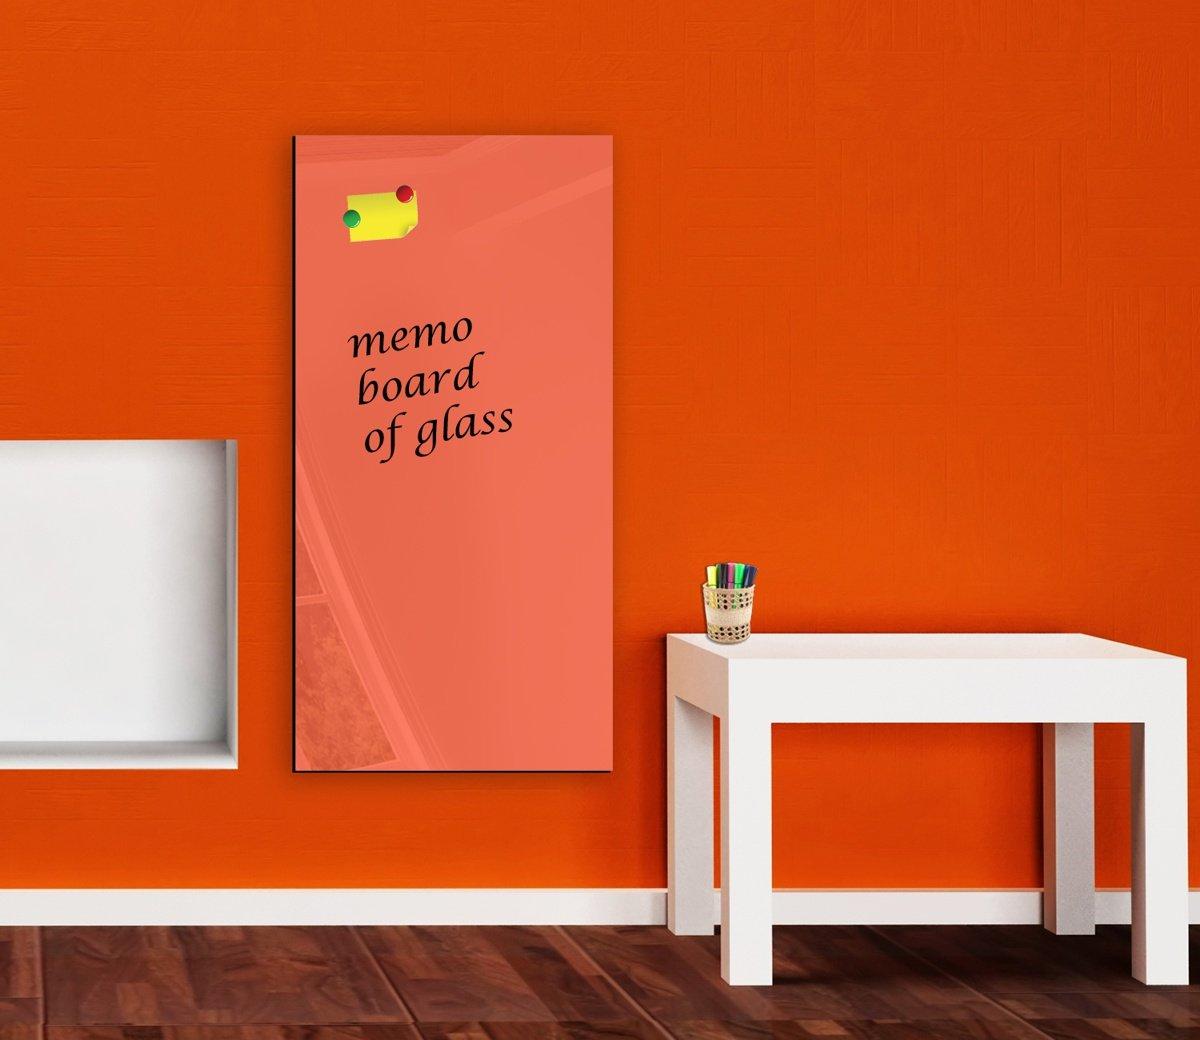 HitGlass Memoboard, Glas, magnetisch, trocken abwischbar, 100 cm x 50 cm, Orange